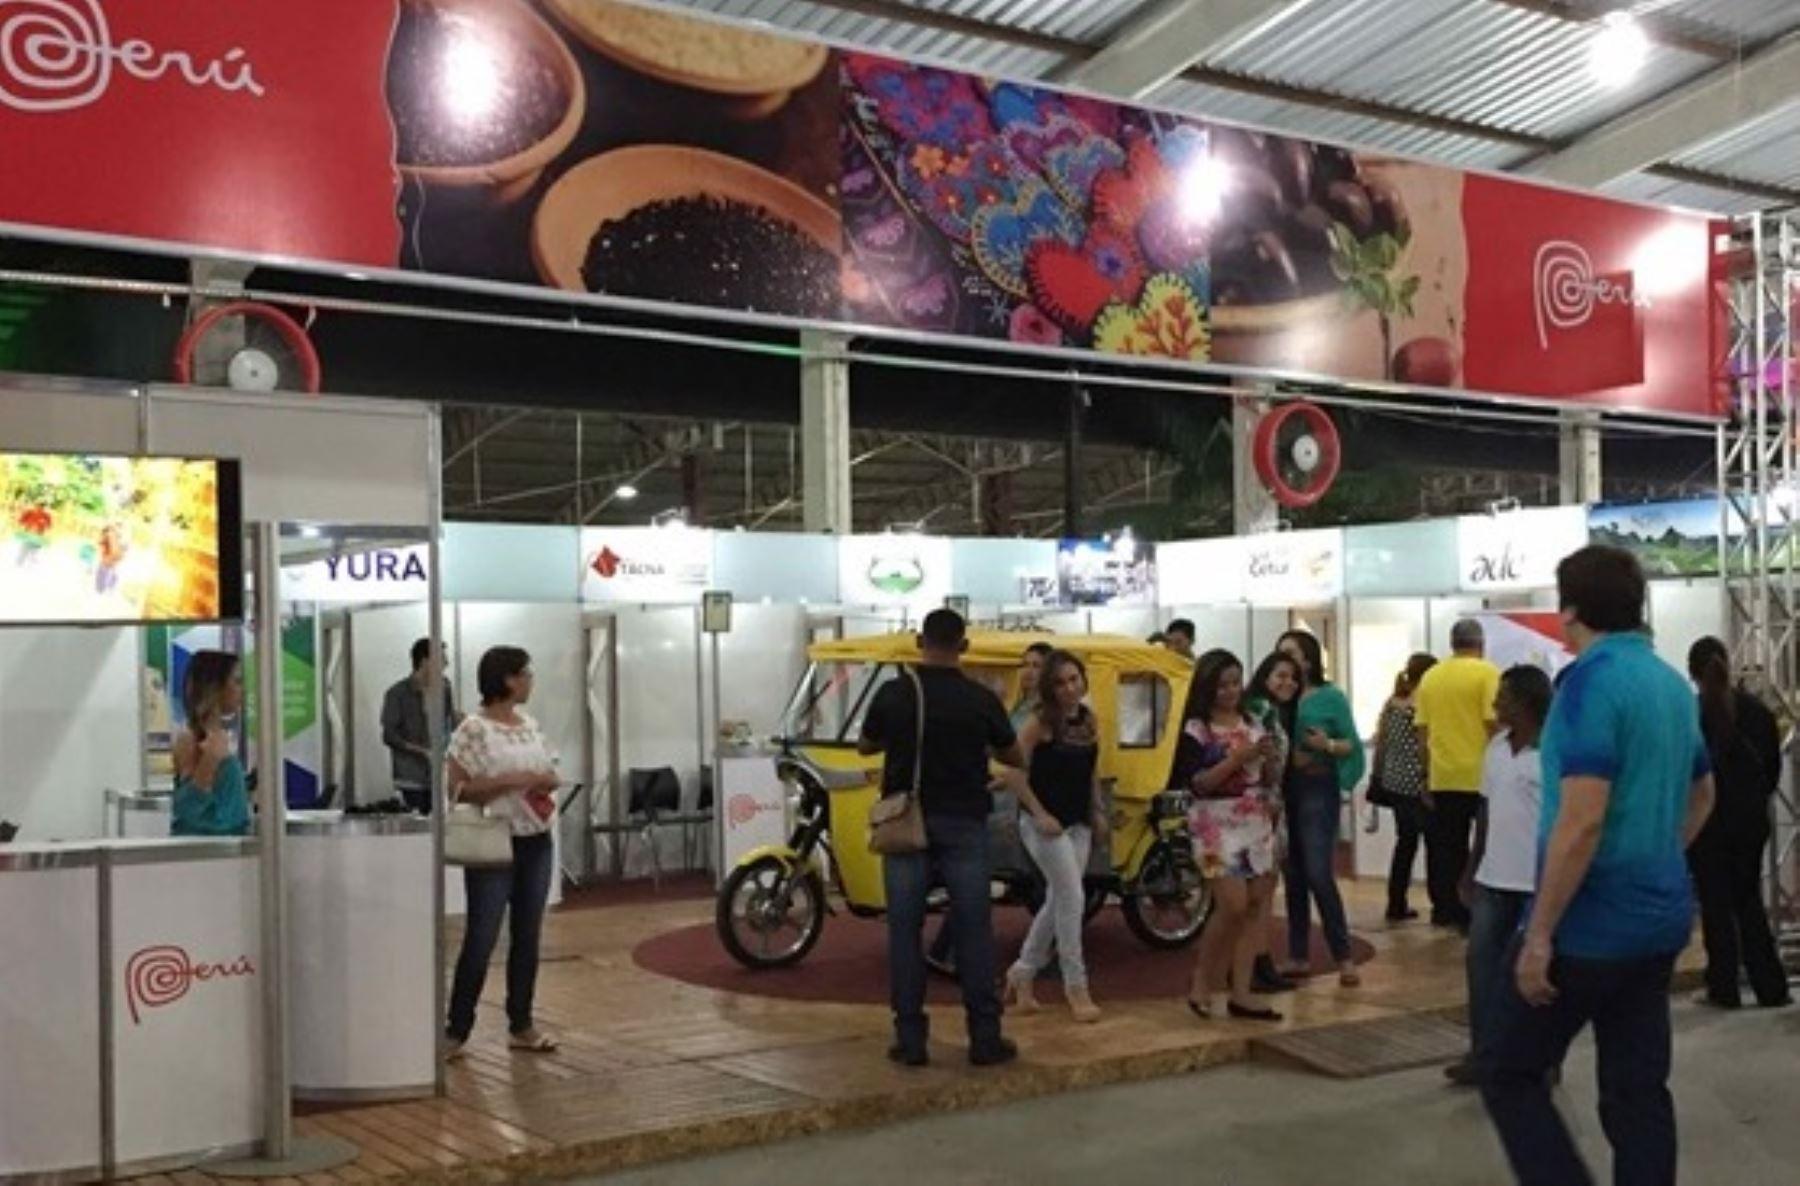 Stand peruano en Feria Expo Acre, realizado en Brasil. Foto: Mincetur.